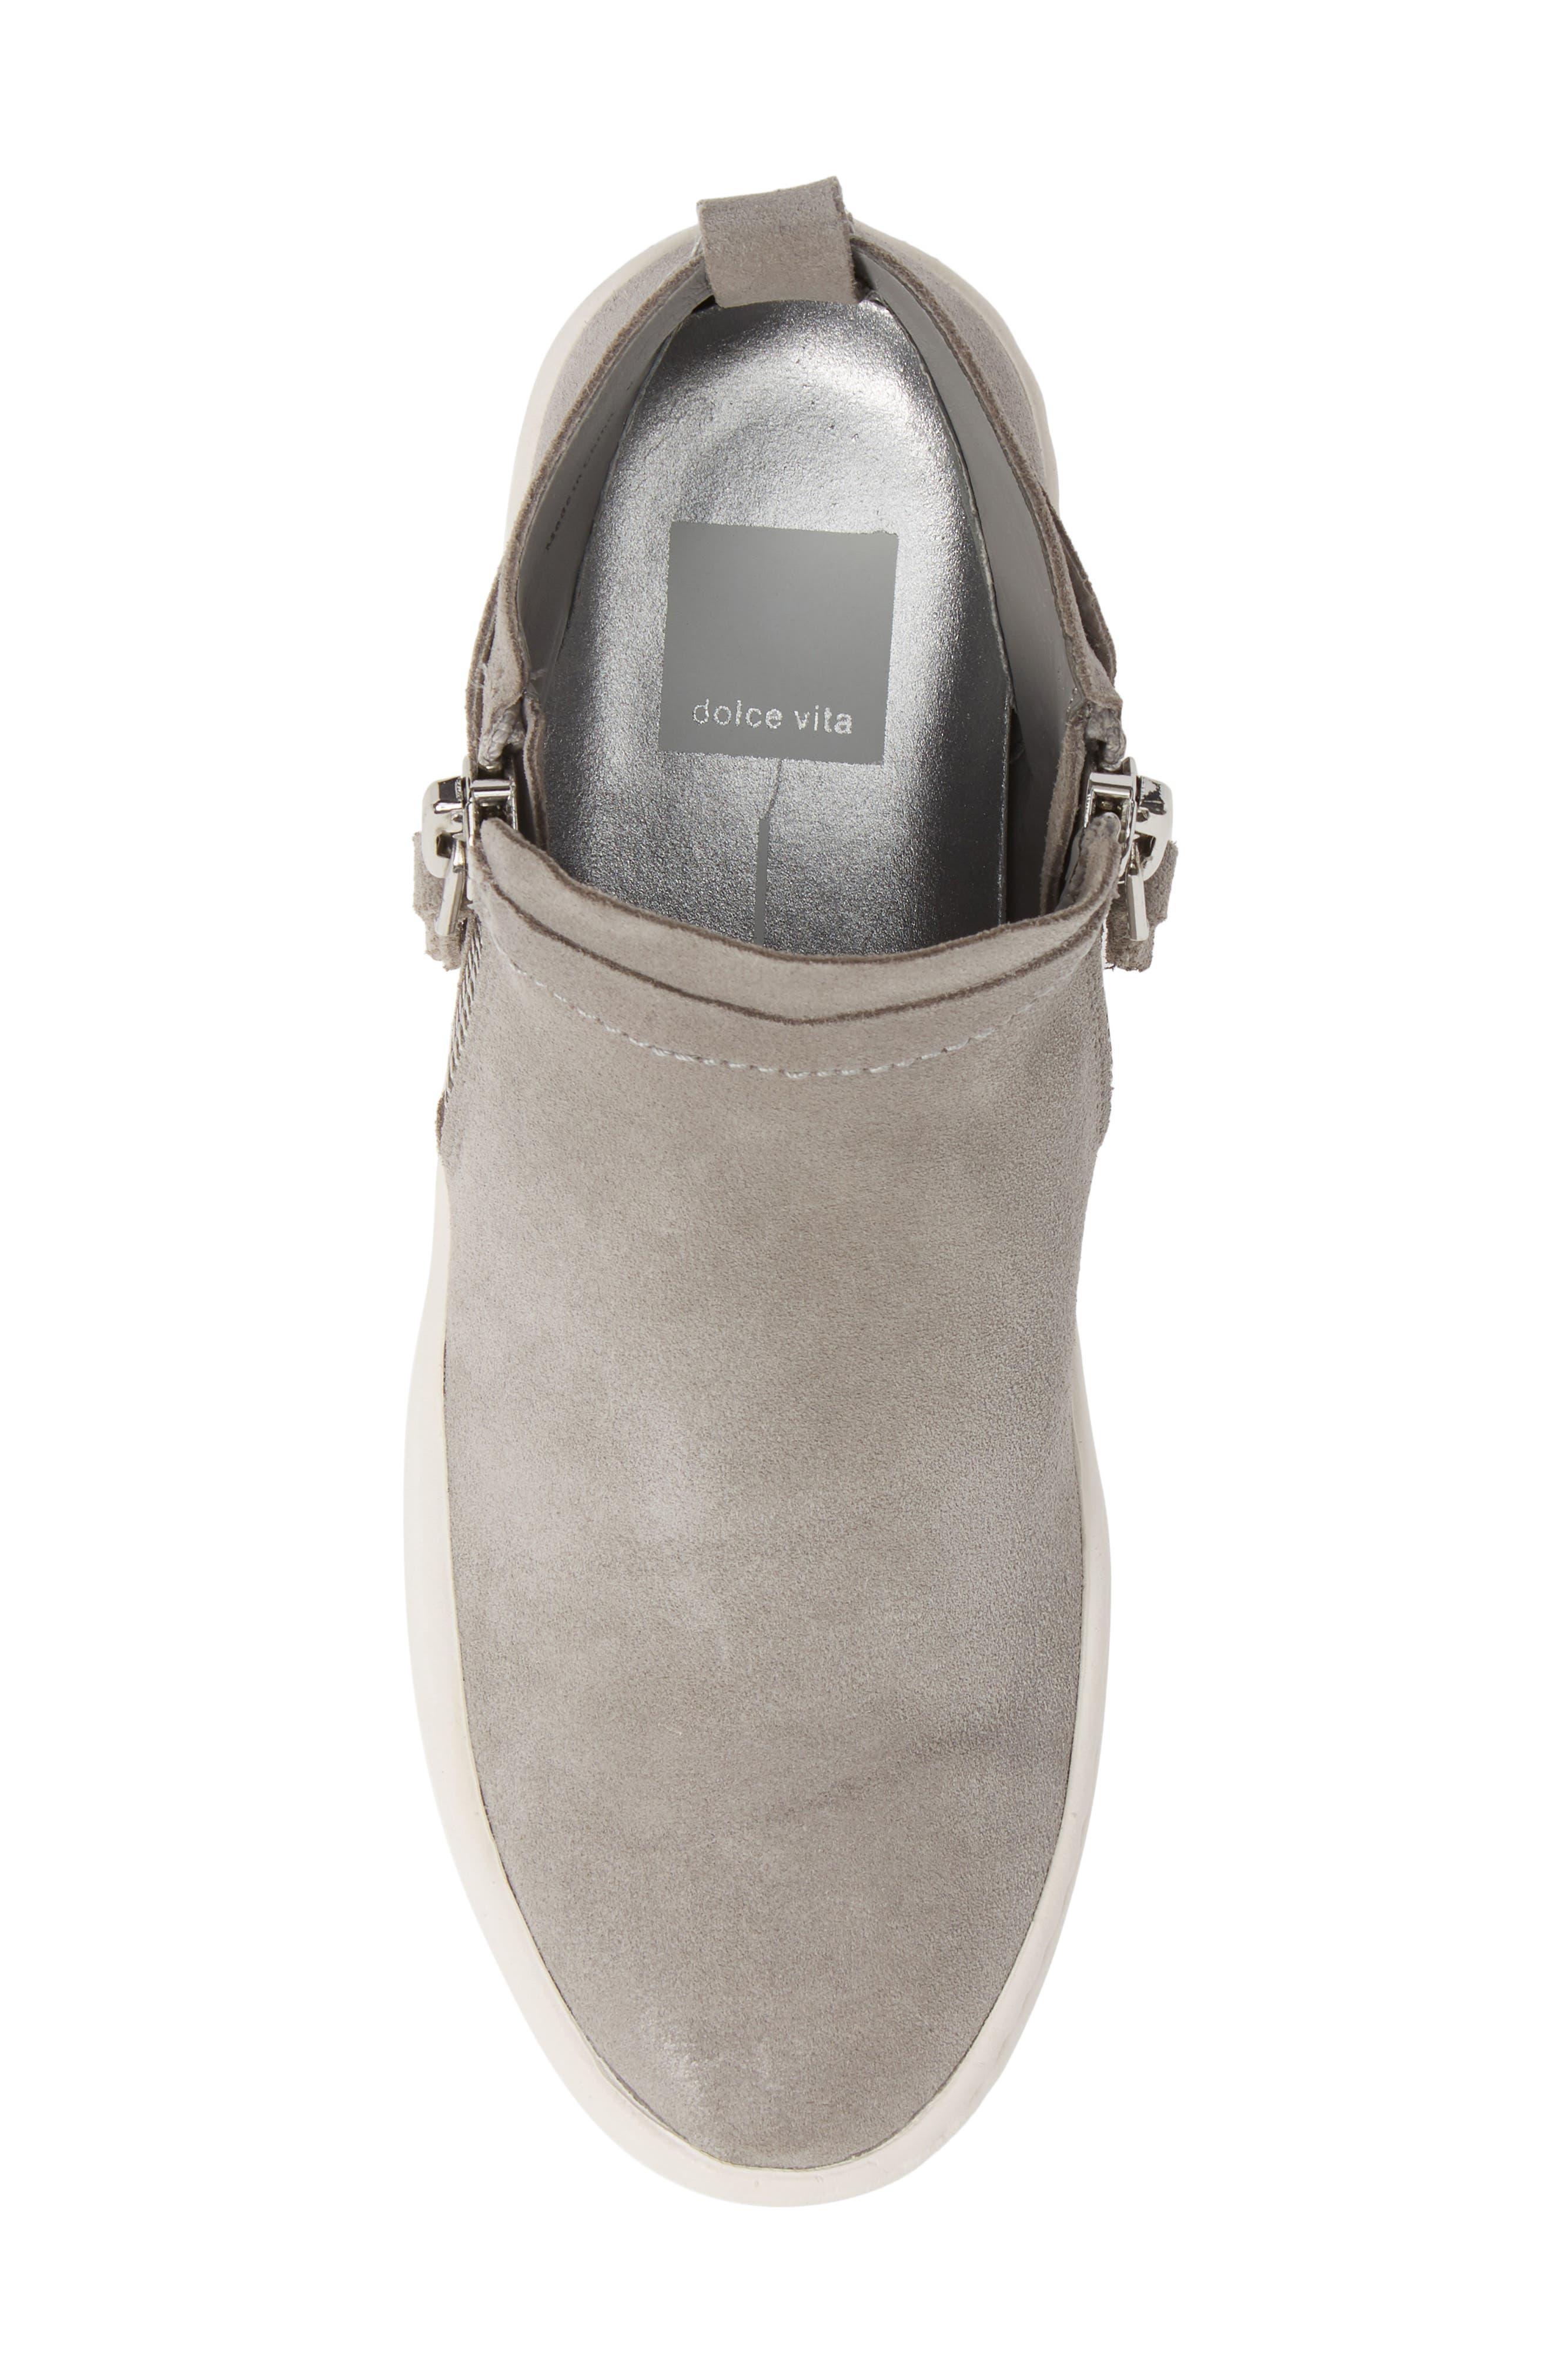 DOLCE VITA,                             Tobee Zip Sneaker,                             Alternate thumbnail 5, color,                             SMOKE SUEDE